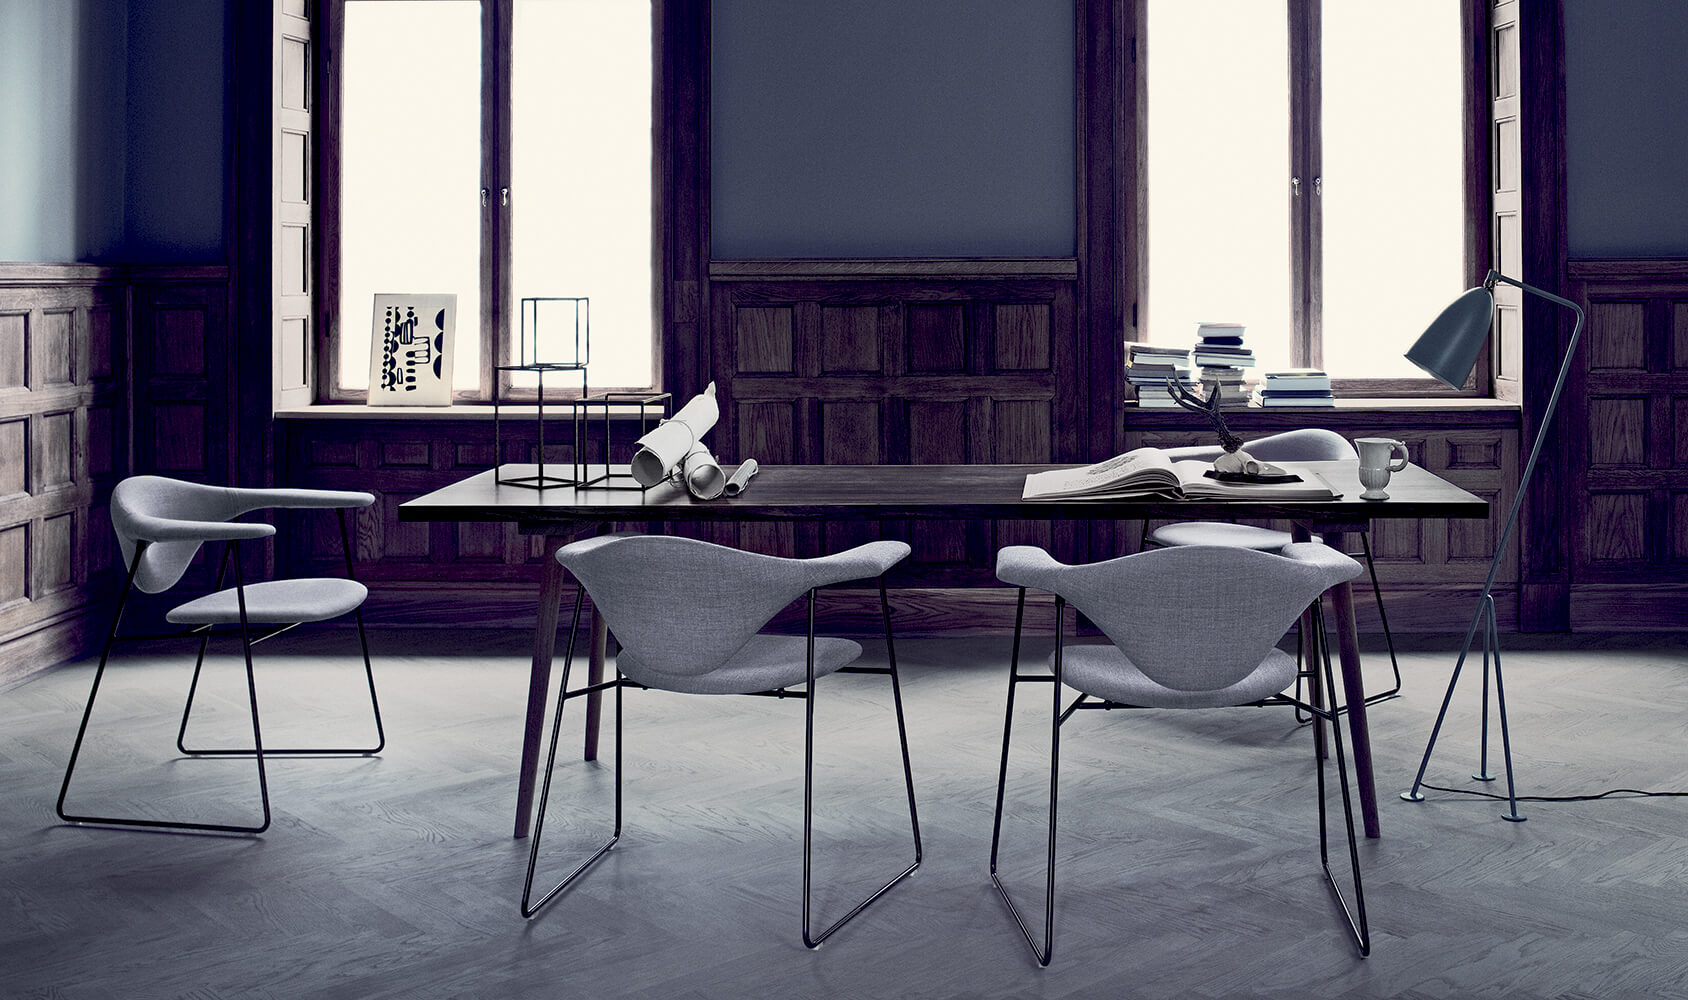 Masculo chair - remix 123 grashoppa floor lamp - anthracite grey